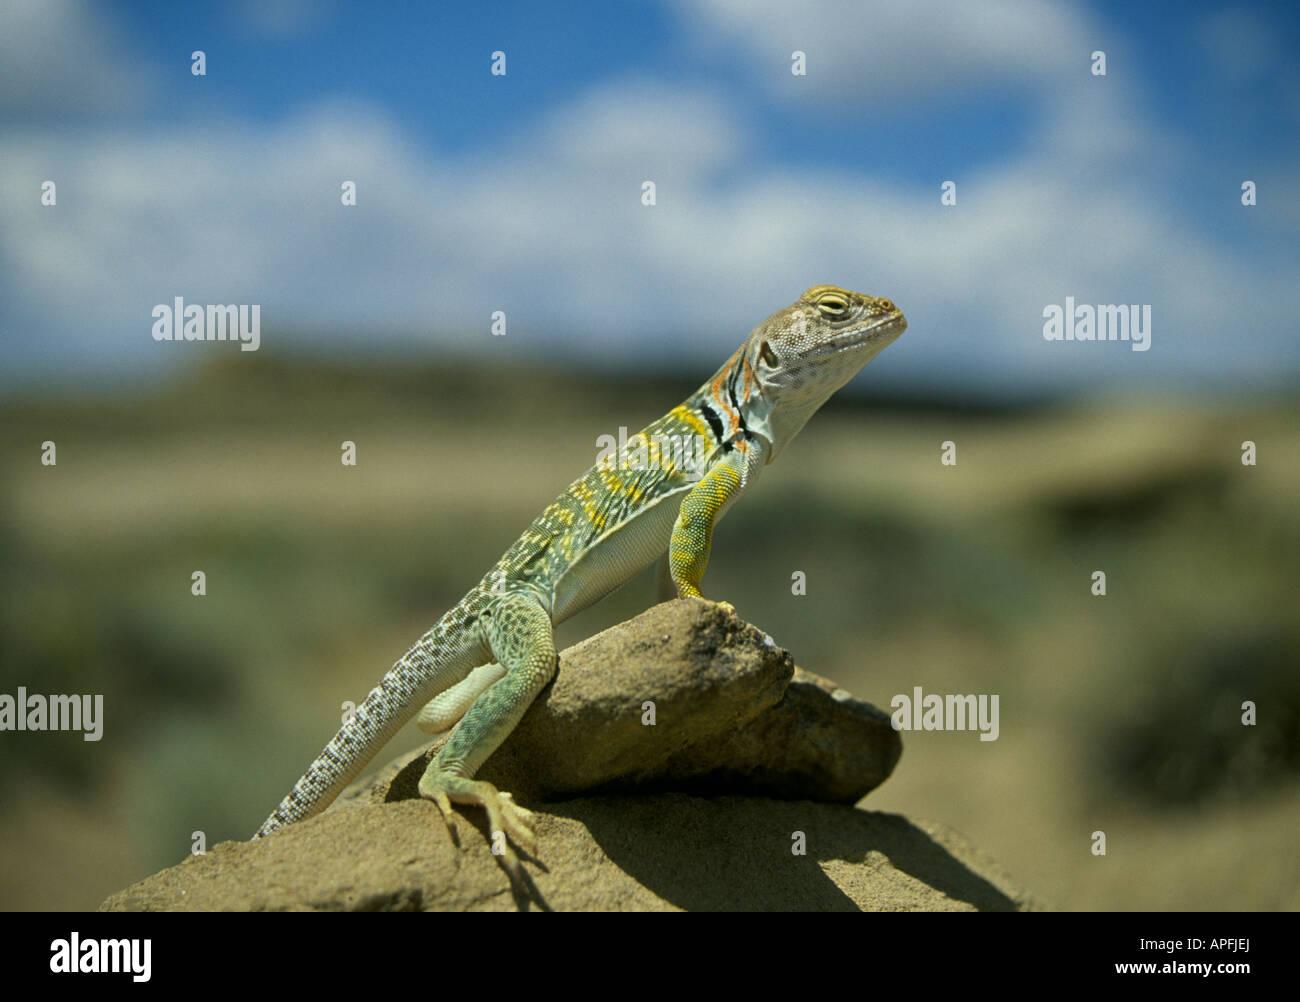 Wallpaper Crotaphytus collaris, Mexico, Lizard, colorful, stone ...